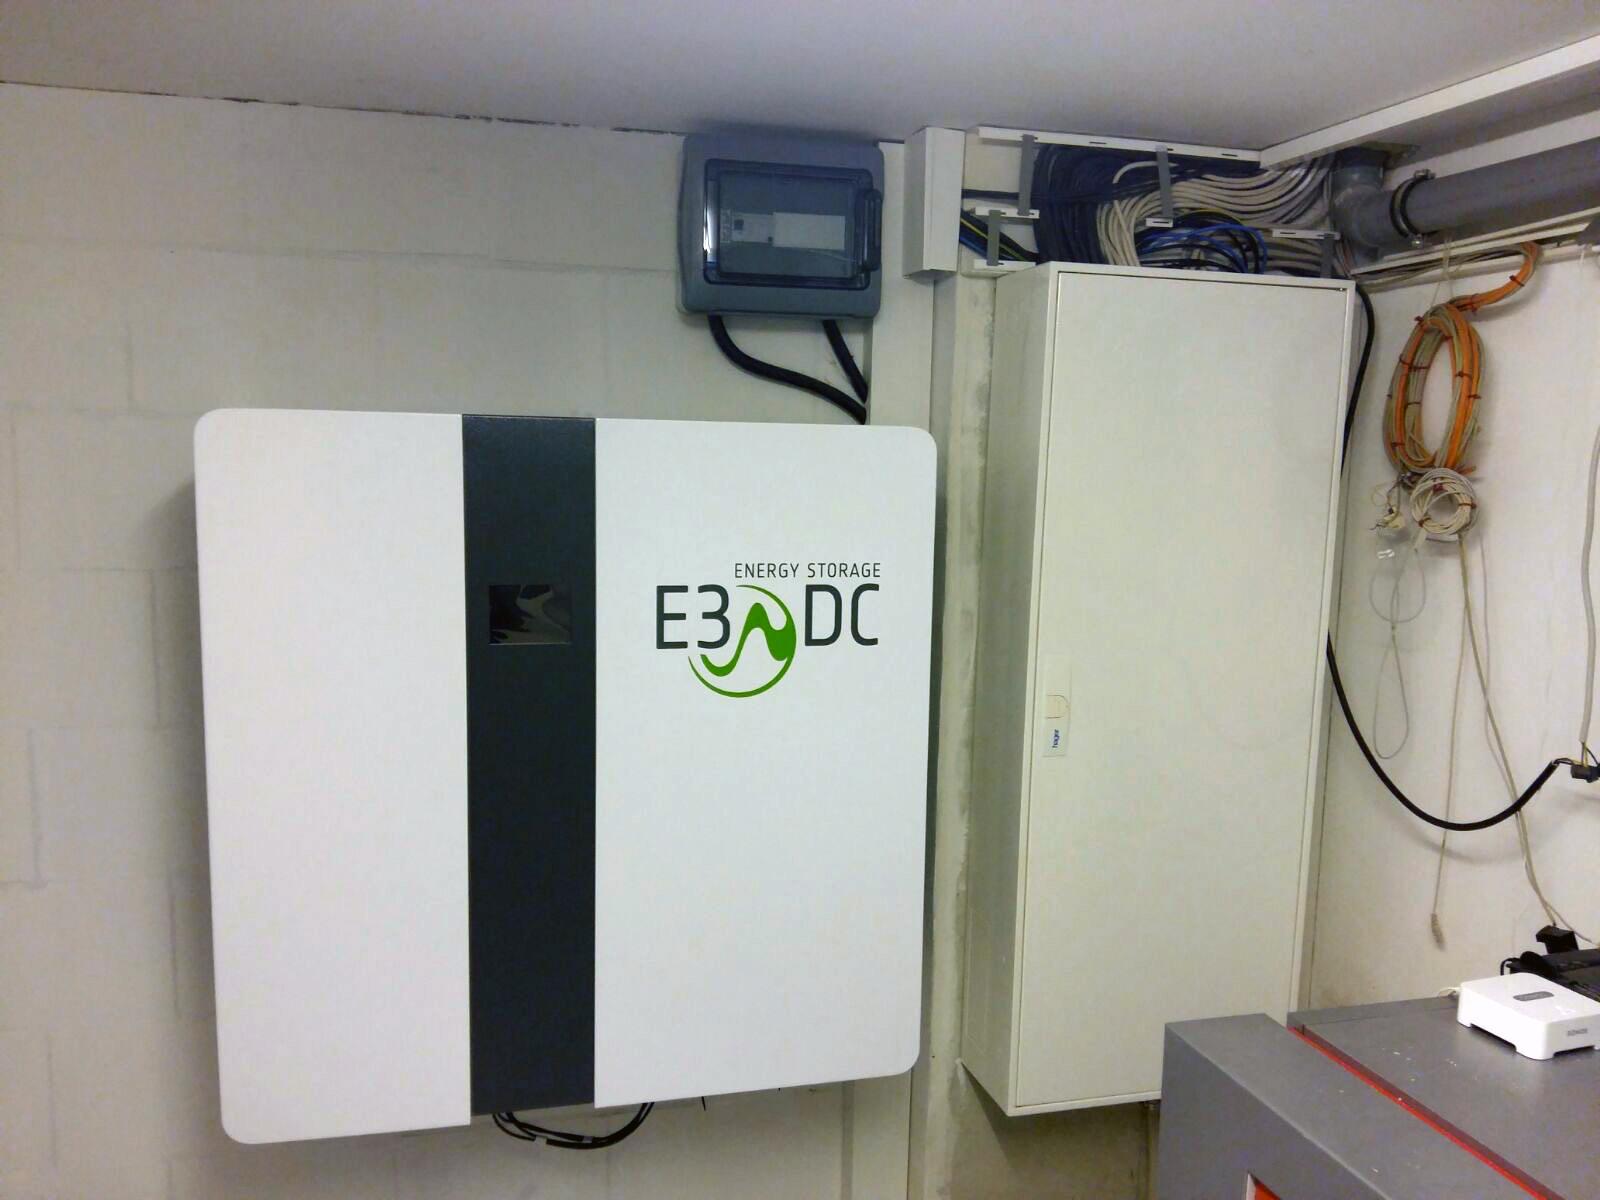 E3DC Speichersystem Mrozewski in 38229 Salzgitter